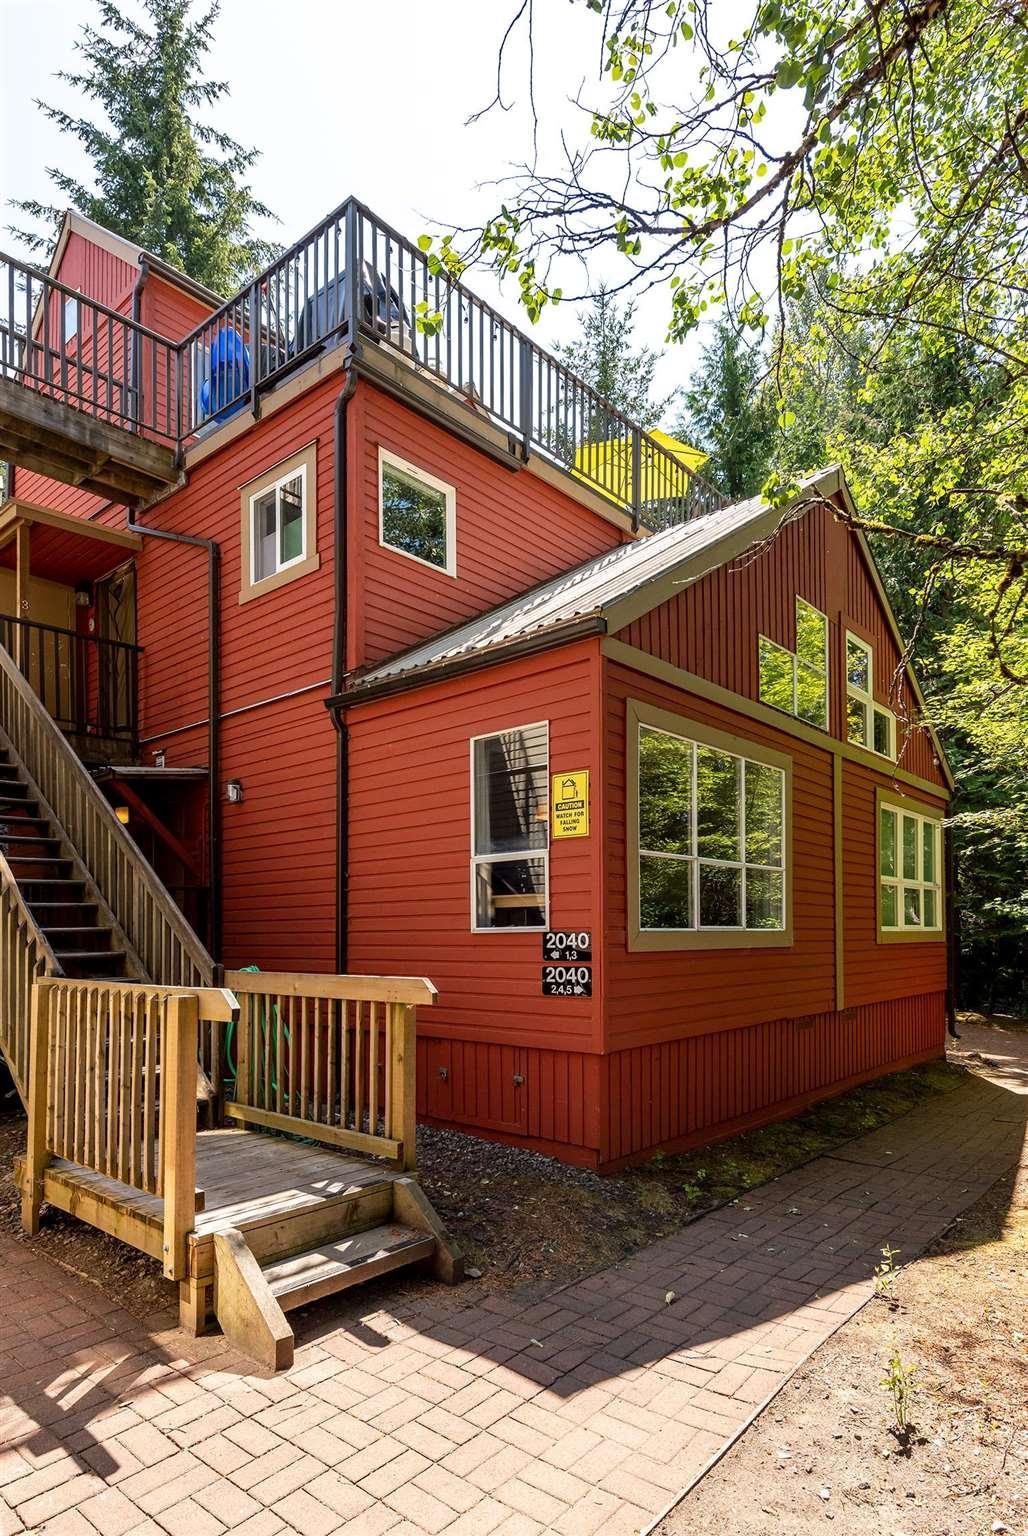 1 2040 INNSBRUCK DRIVE - Whistler Creek Apartment/Condo for sale, 1 Bedroom (R2602230)